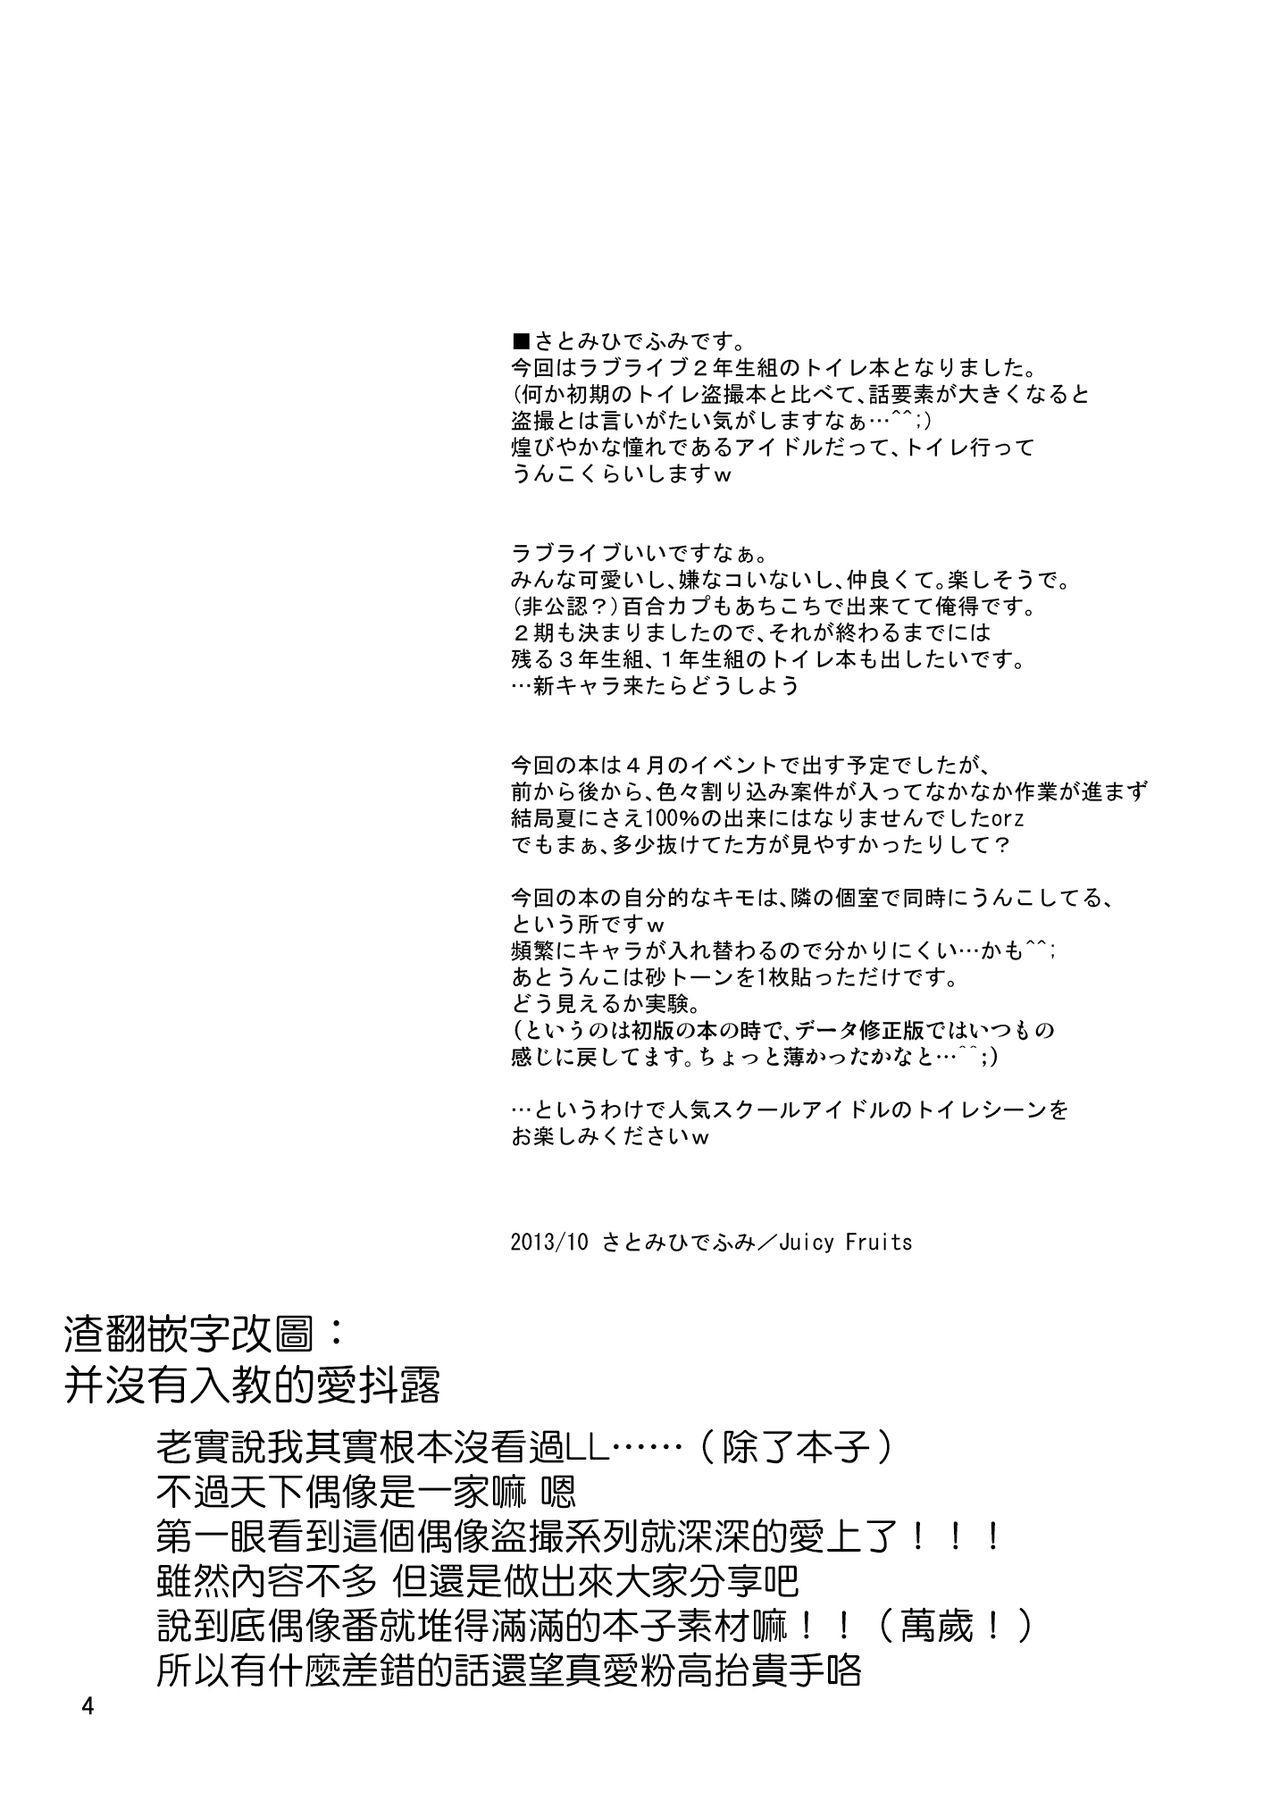 Bou Ninki School Idol Toilet Tousatsu vol. 1   某人氣學園偶像 廁所盜攝 Vol. 1 2